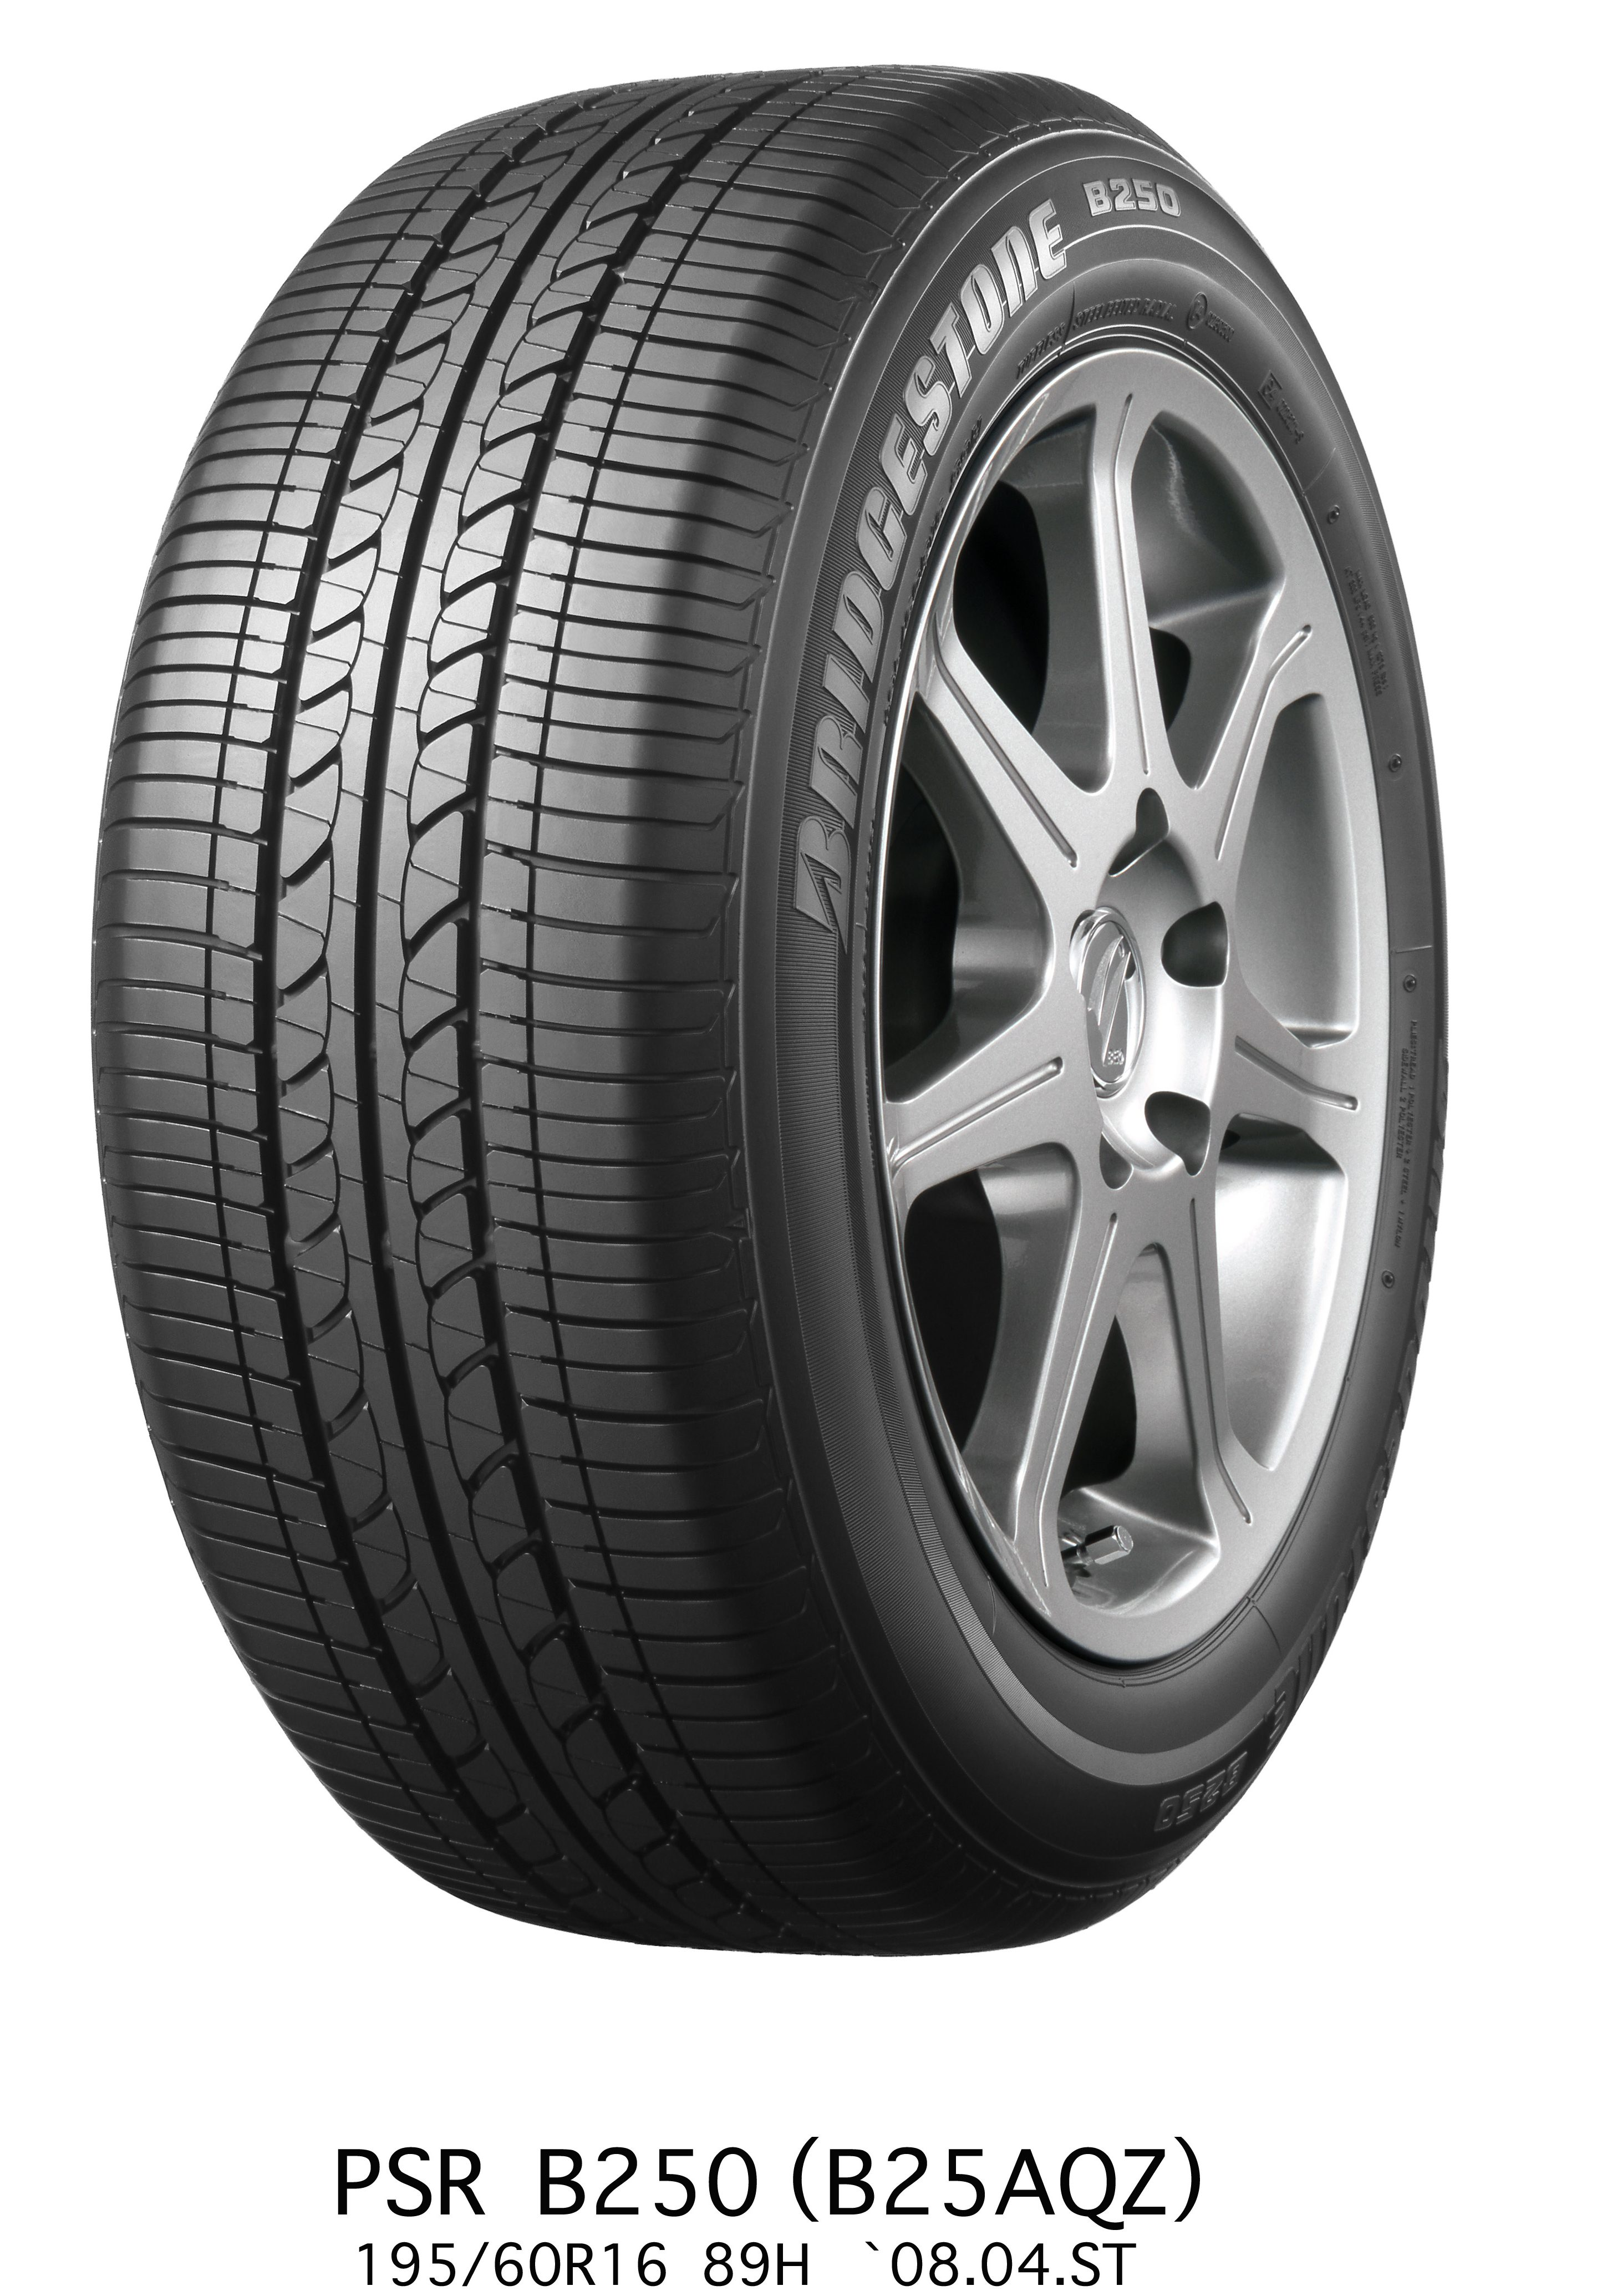 175/70 R13 B250 Bridgestone India